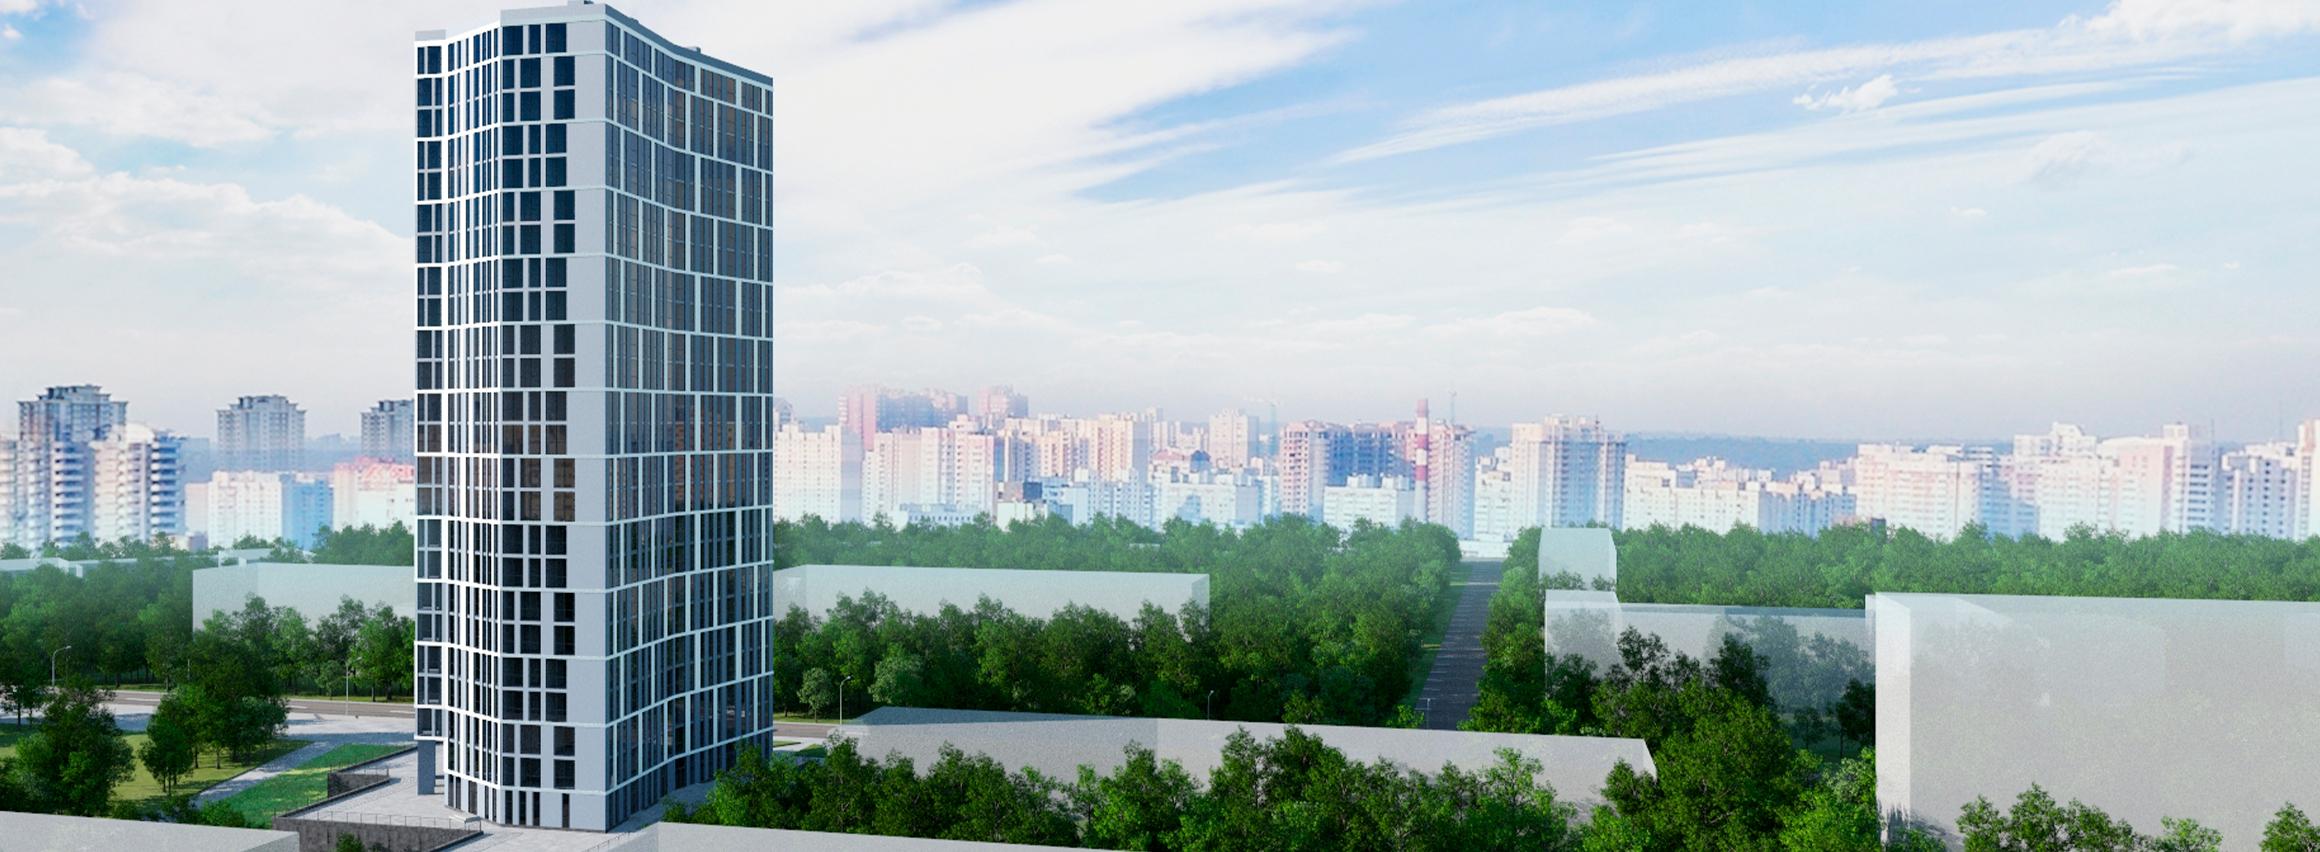 Ход строительства ЖК «Вежа на Ломоносова» в феврале 2021